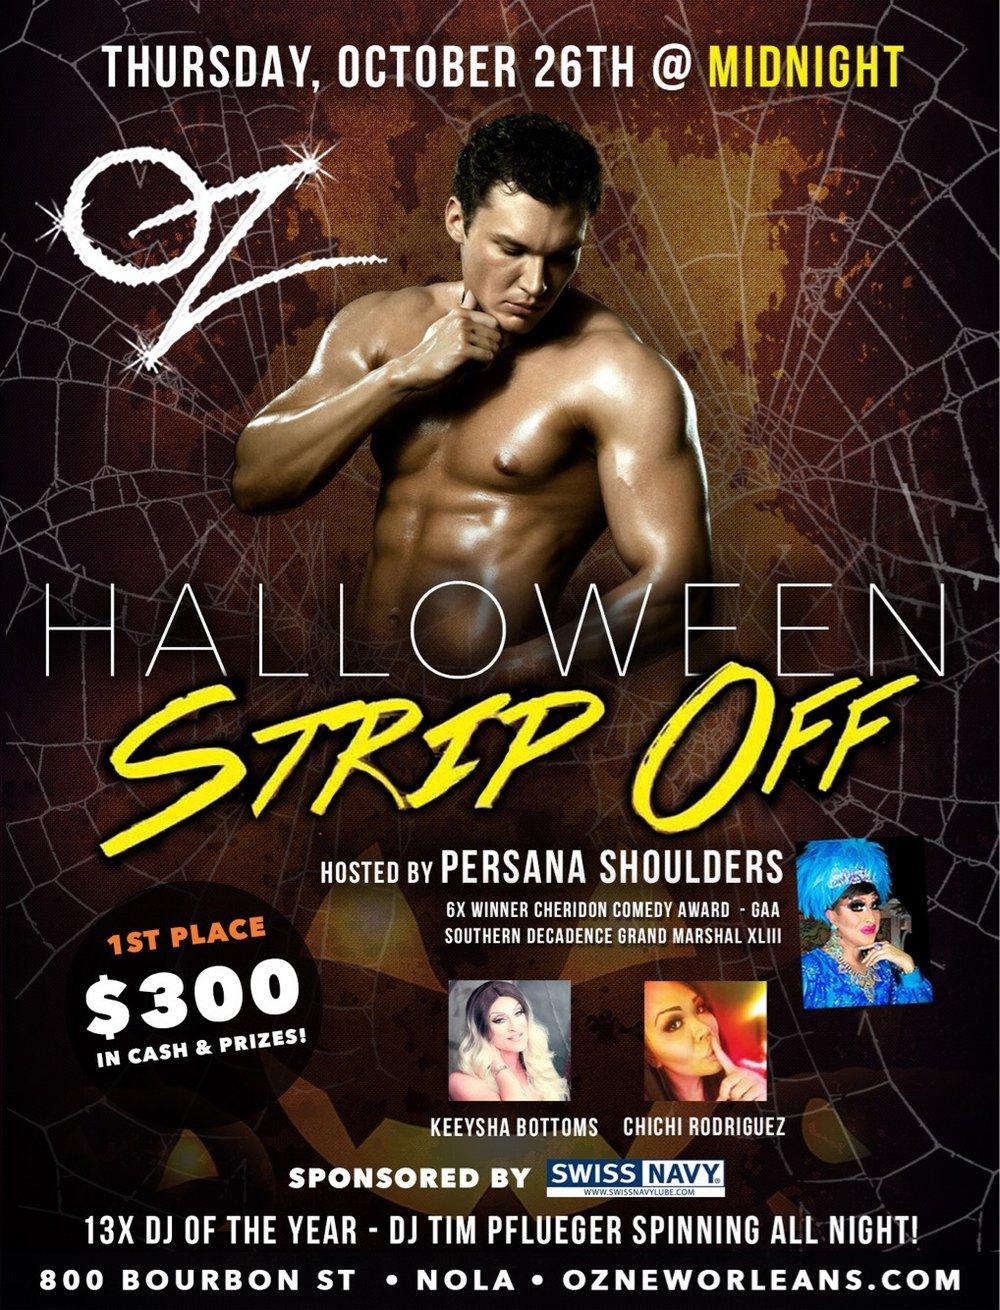 20171026_Halloween_StripOff.jpg